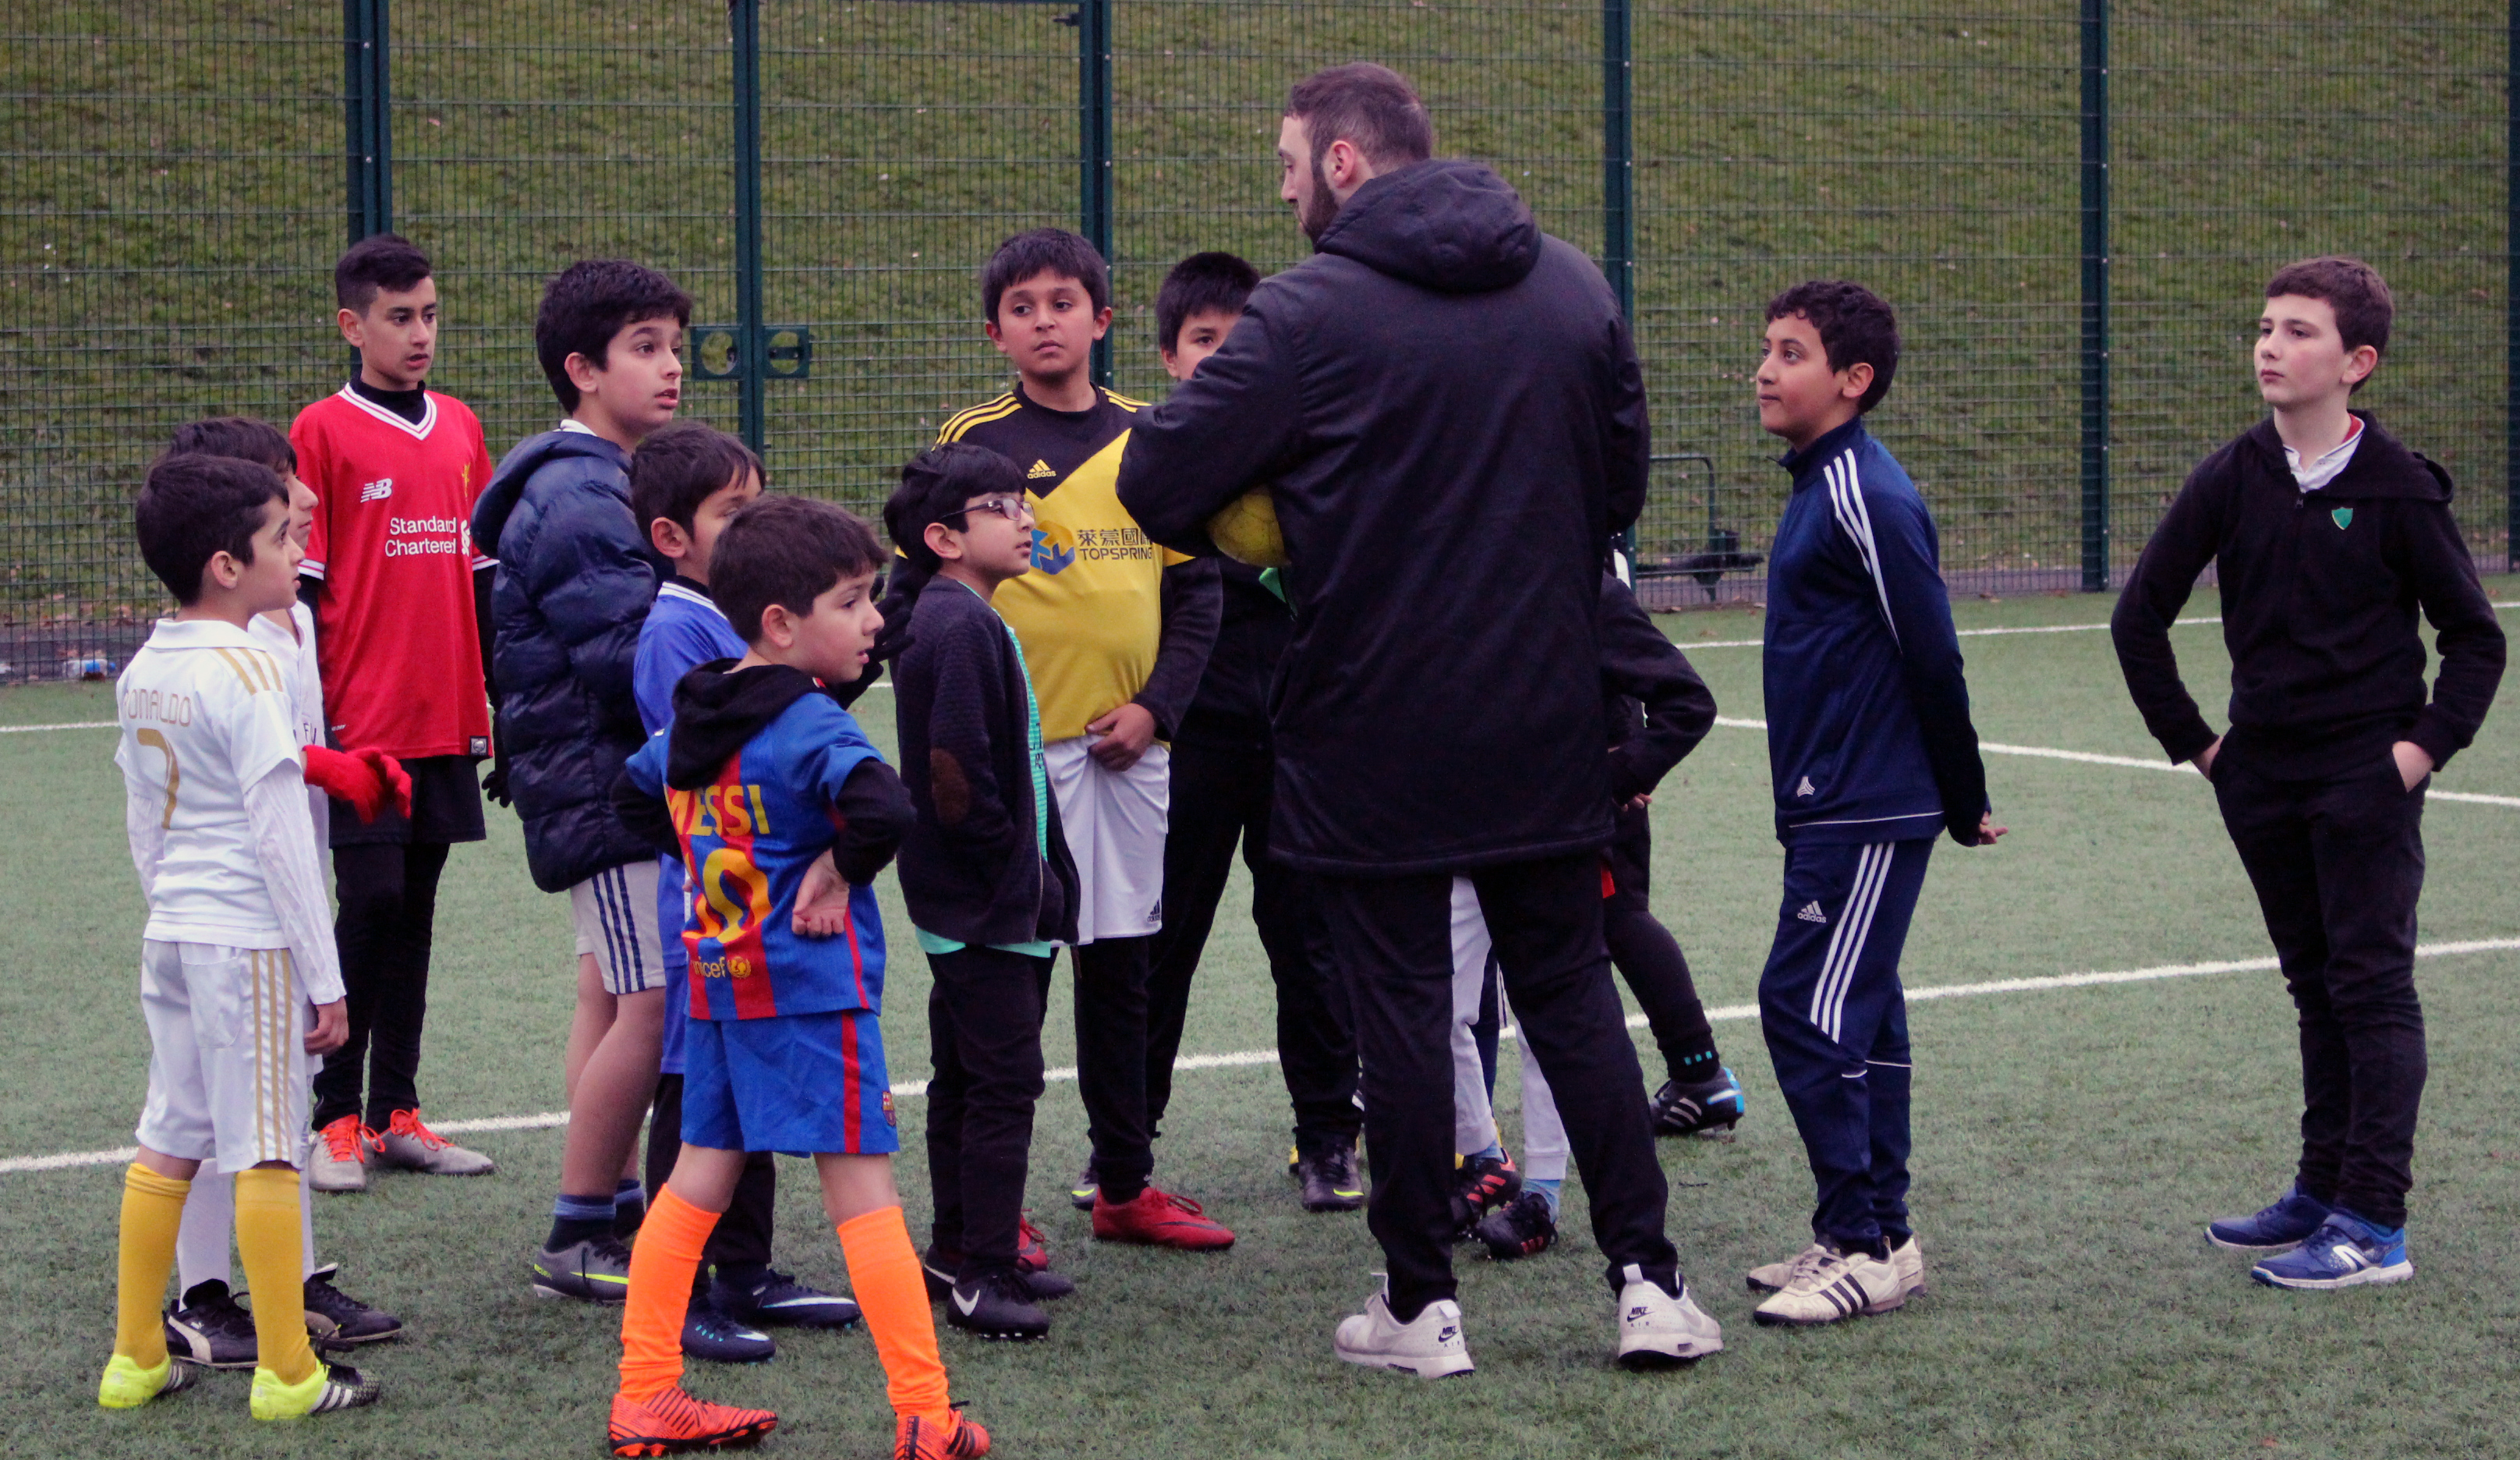 Football coaching - Sandro and juniors